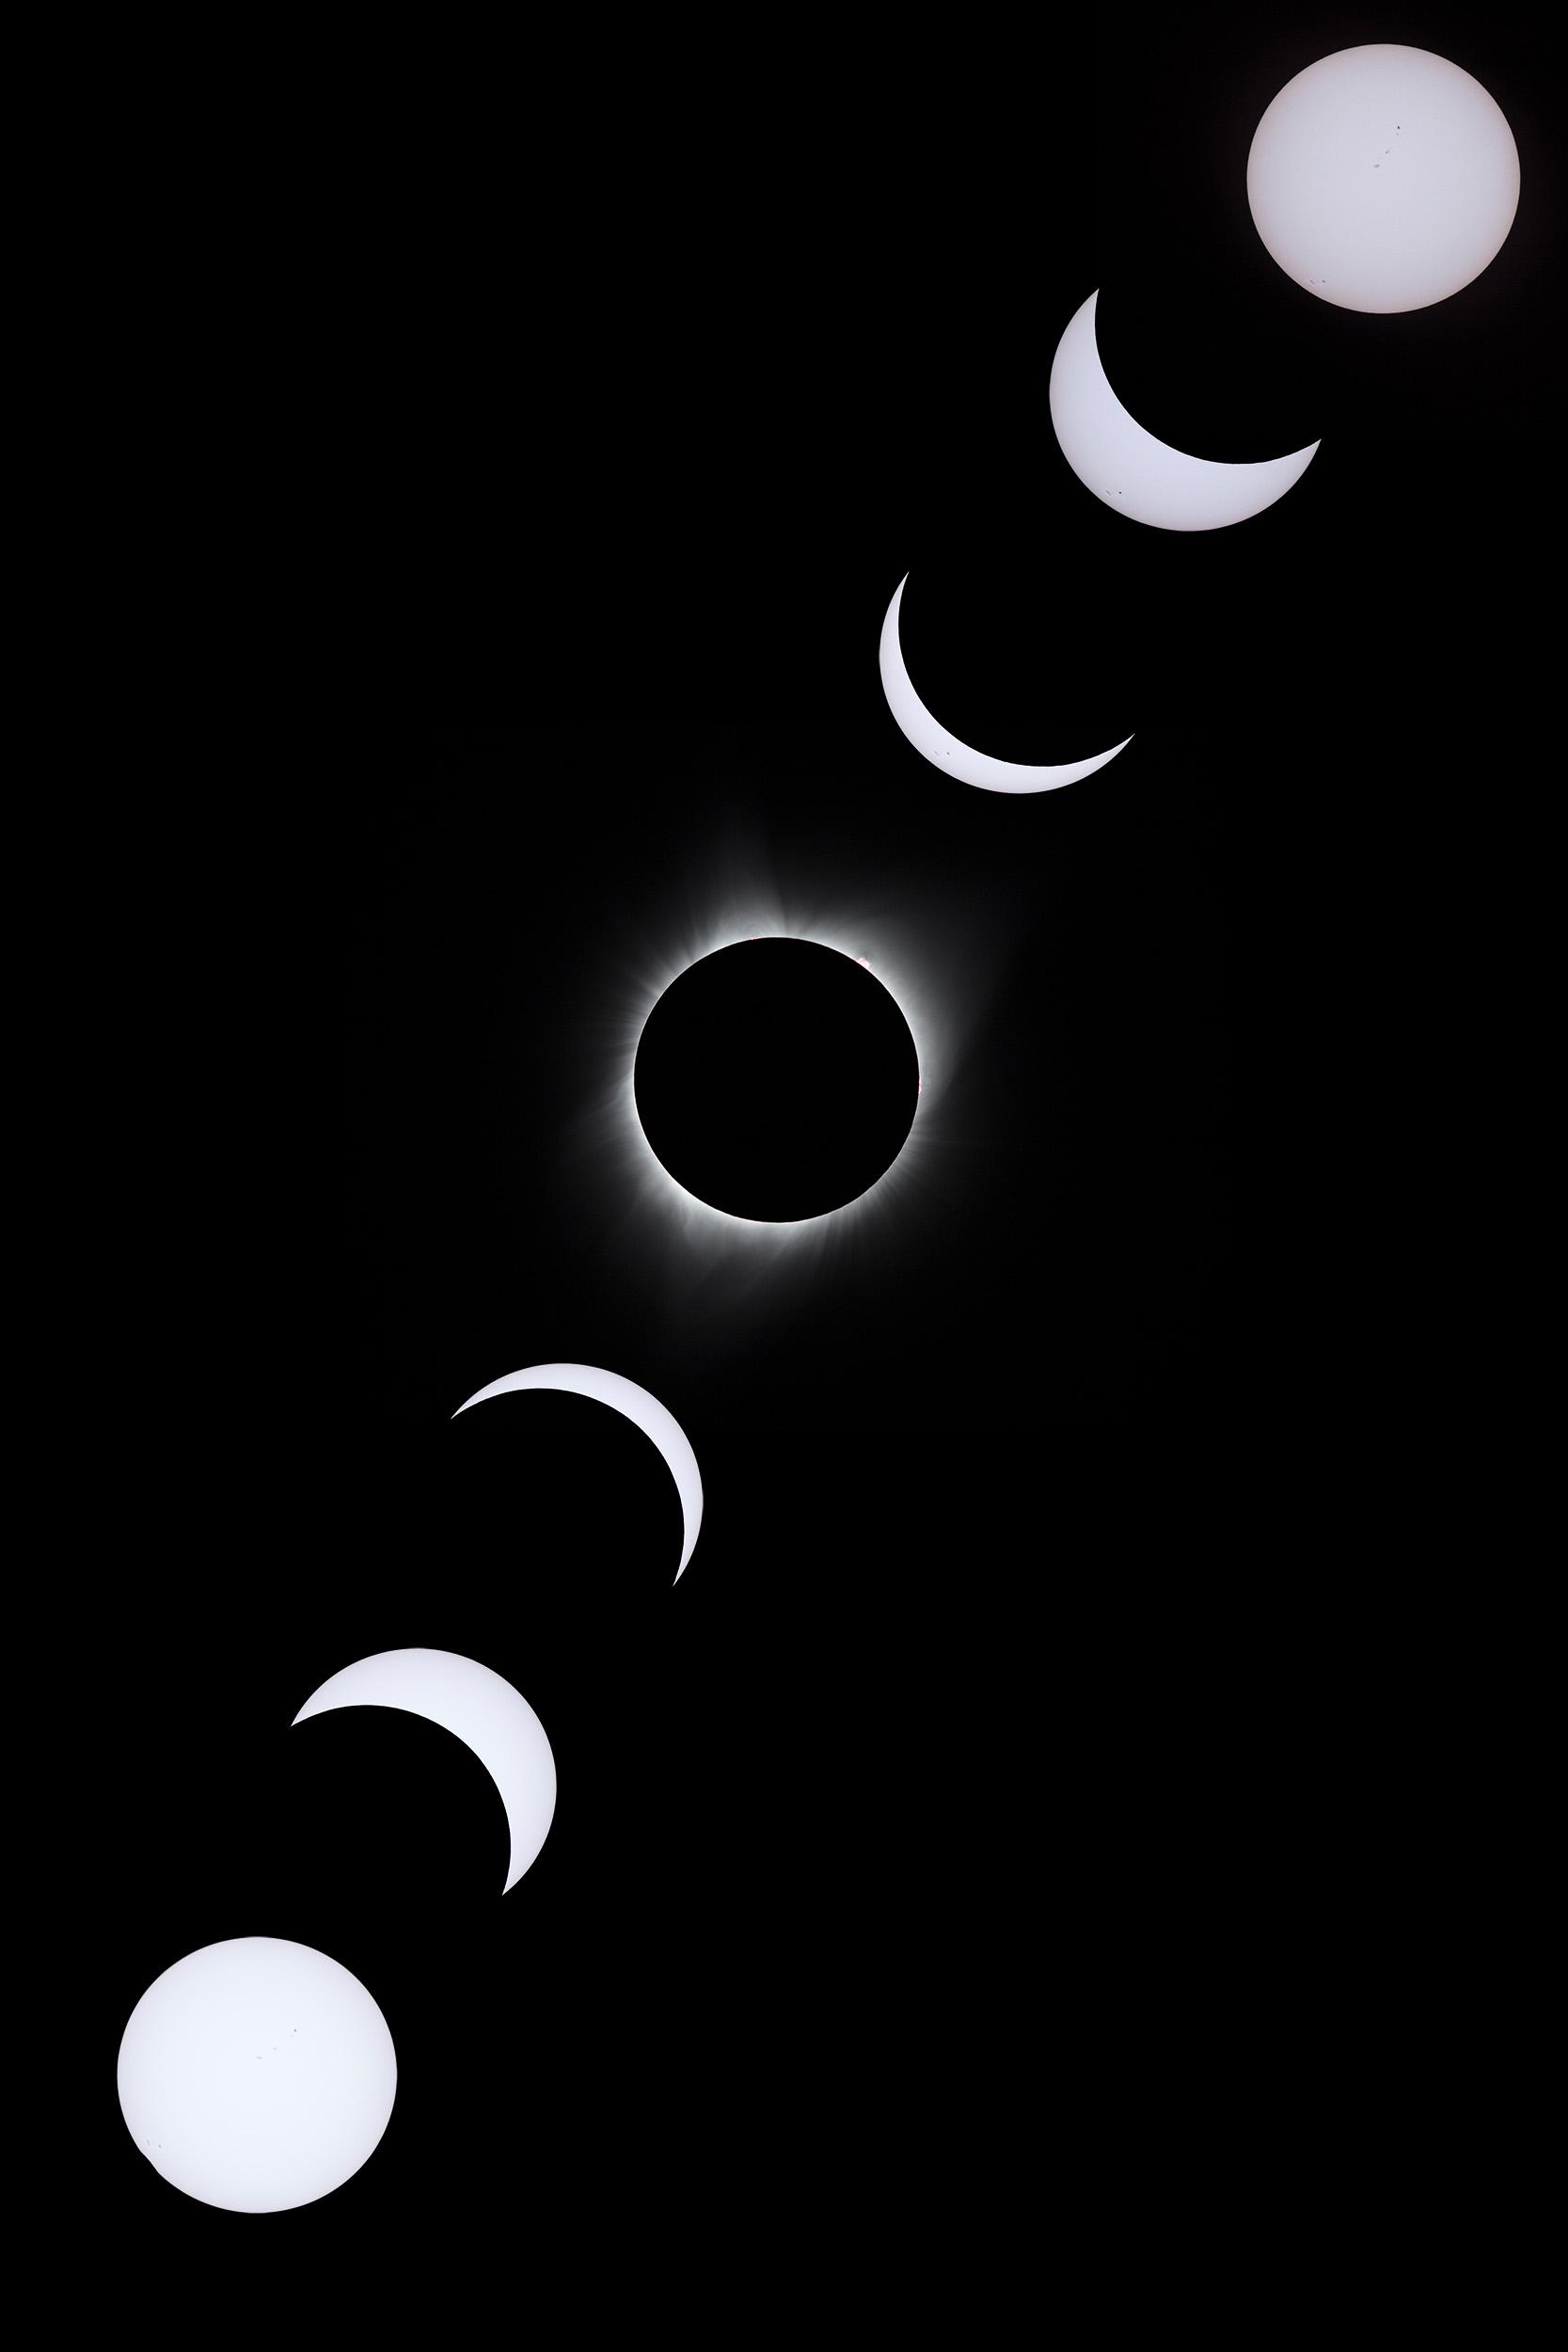 eclipse sequence_2.jpg